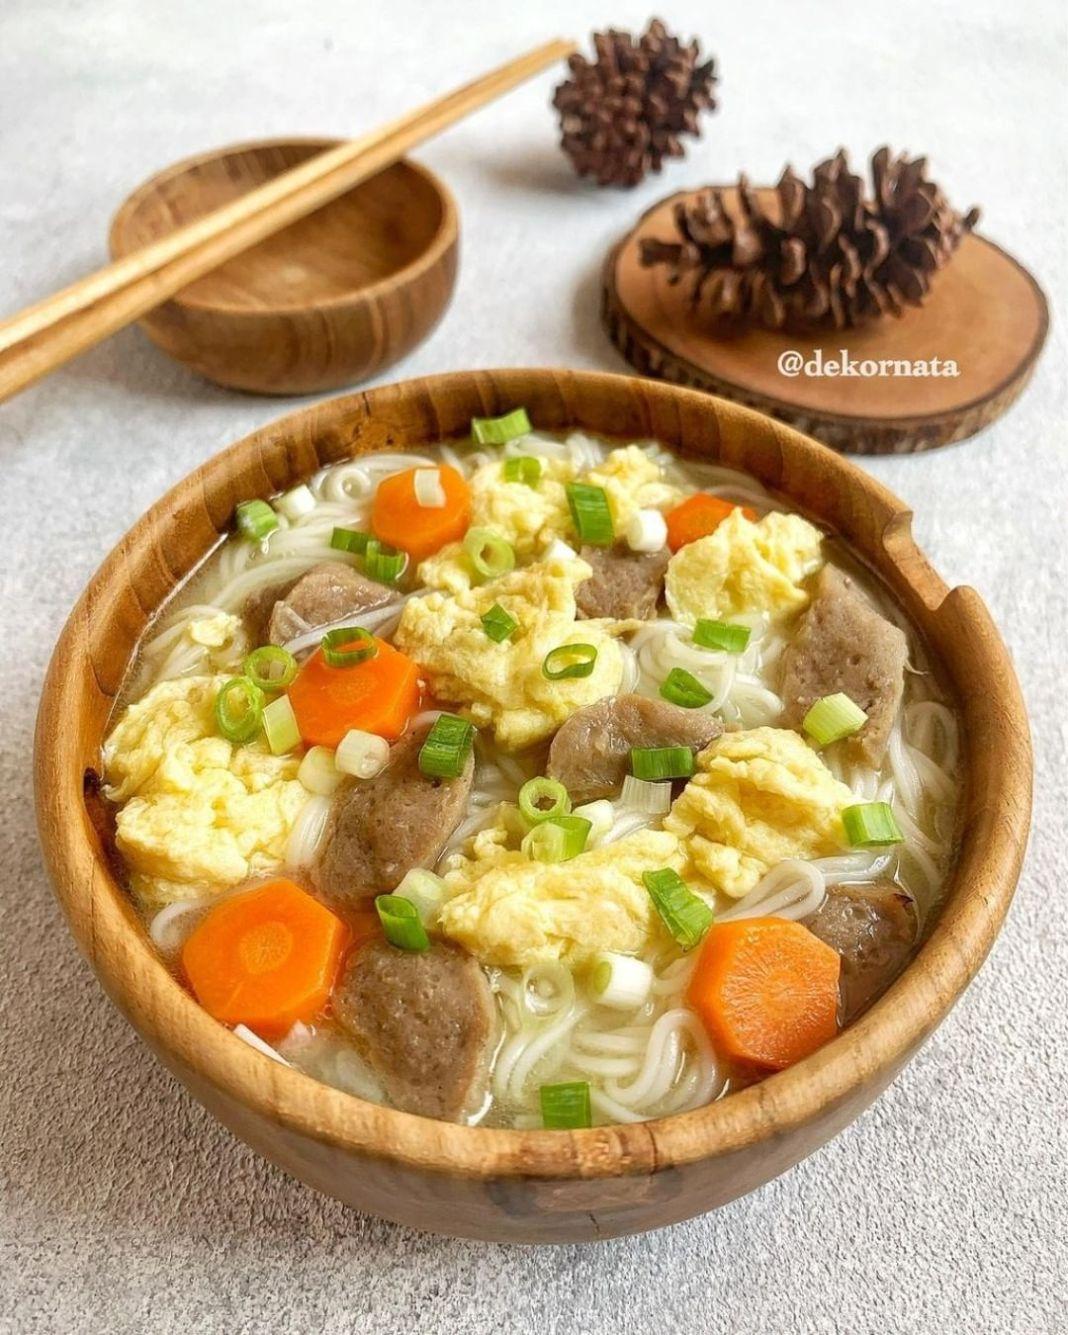 Info kuliner, Resep bikin misua kuah nih, dijamin dari anak kecil sampe orang tua bakal suka banget!  MISUA K…